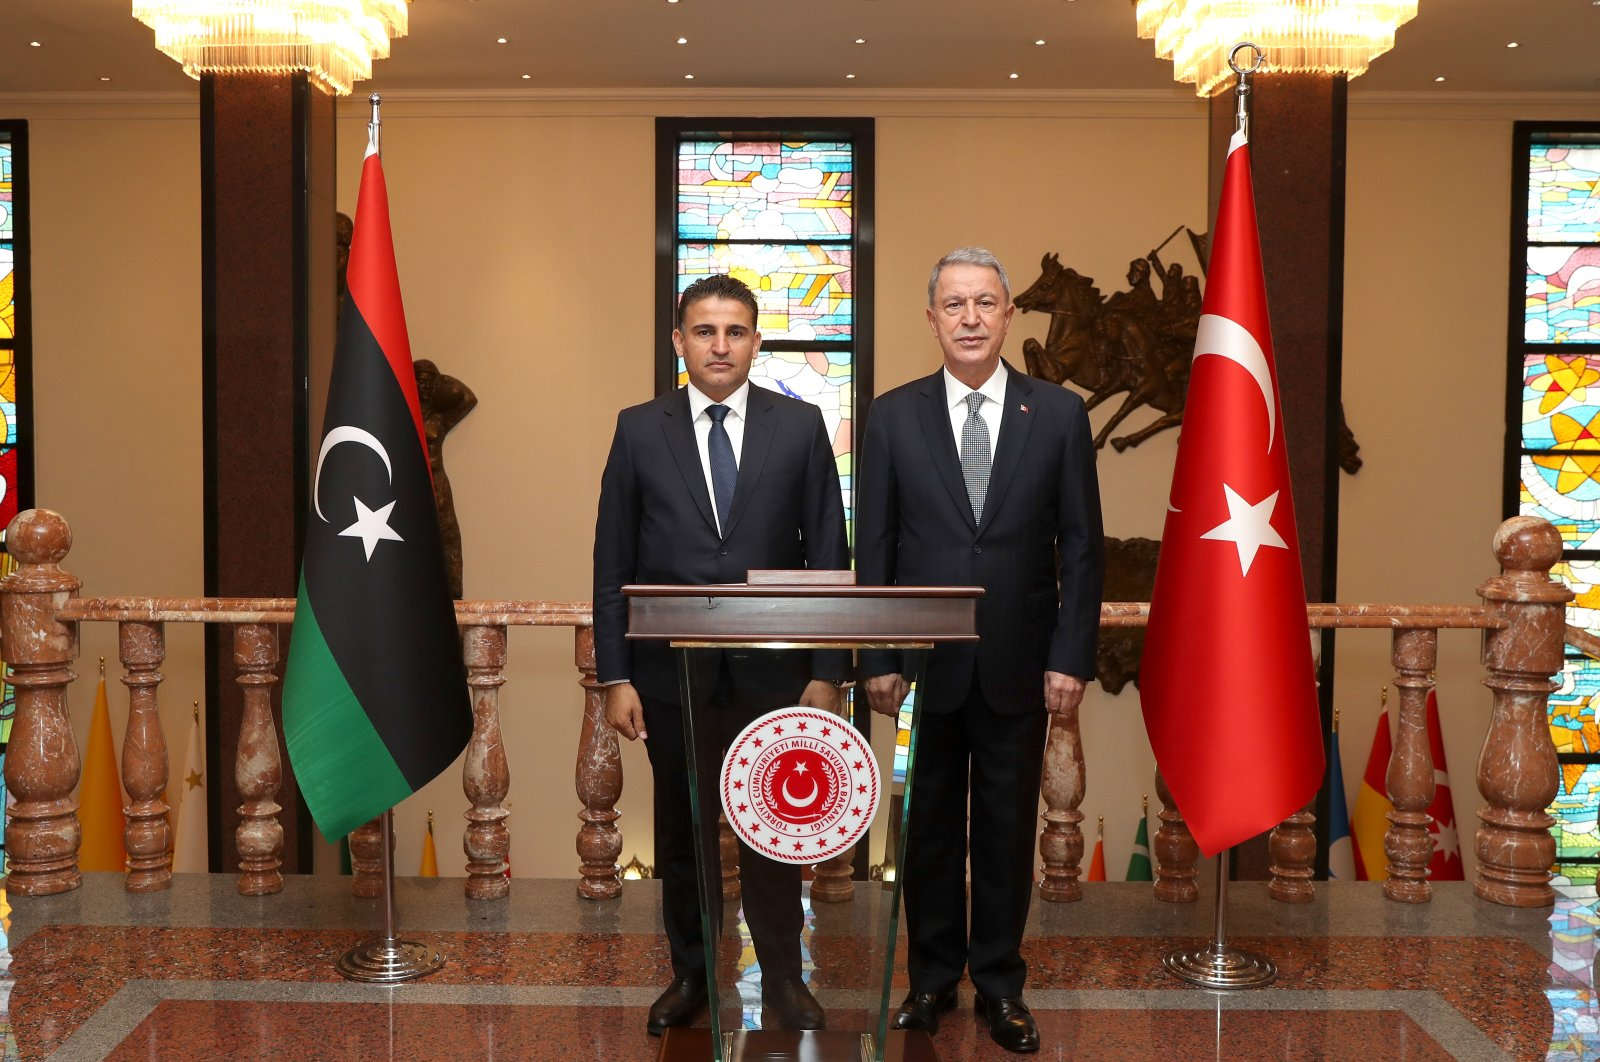 Defense Minister Hulusia Akar receives his Libyan counterpart Salahaddin Namroush in the capital Ankara, Oct. 1, 2020. (AA Photo)